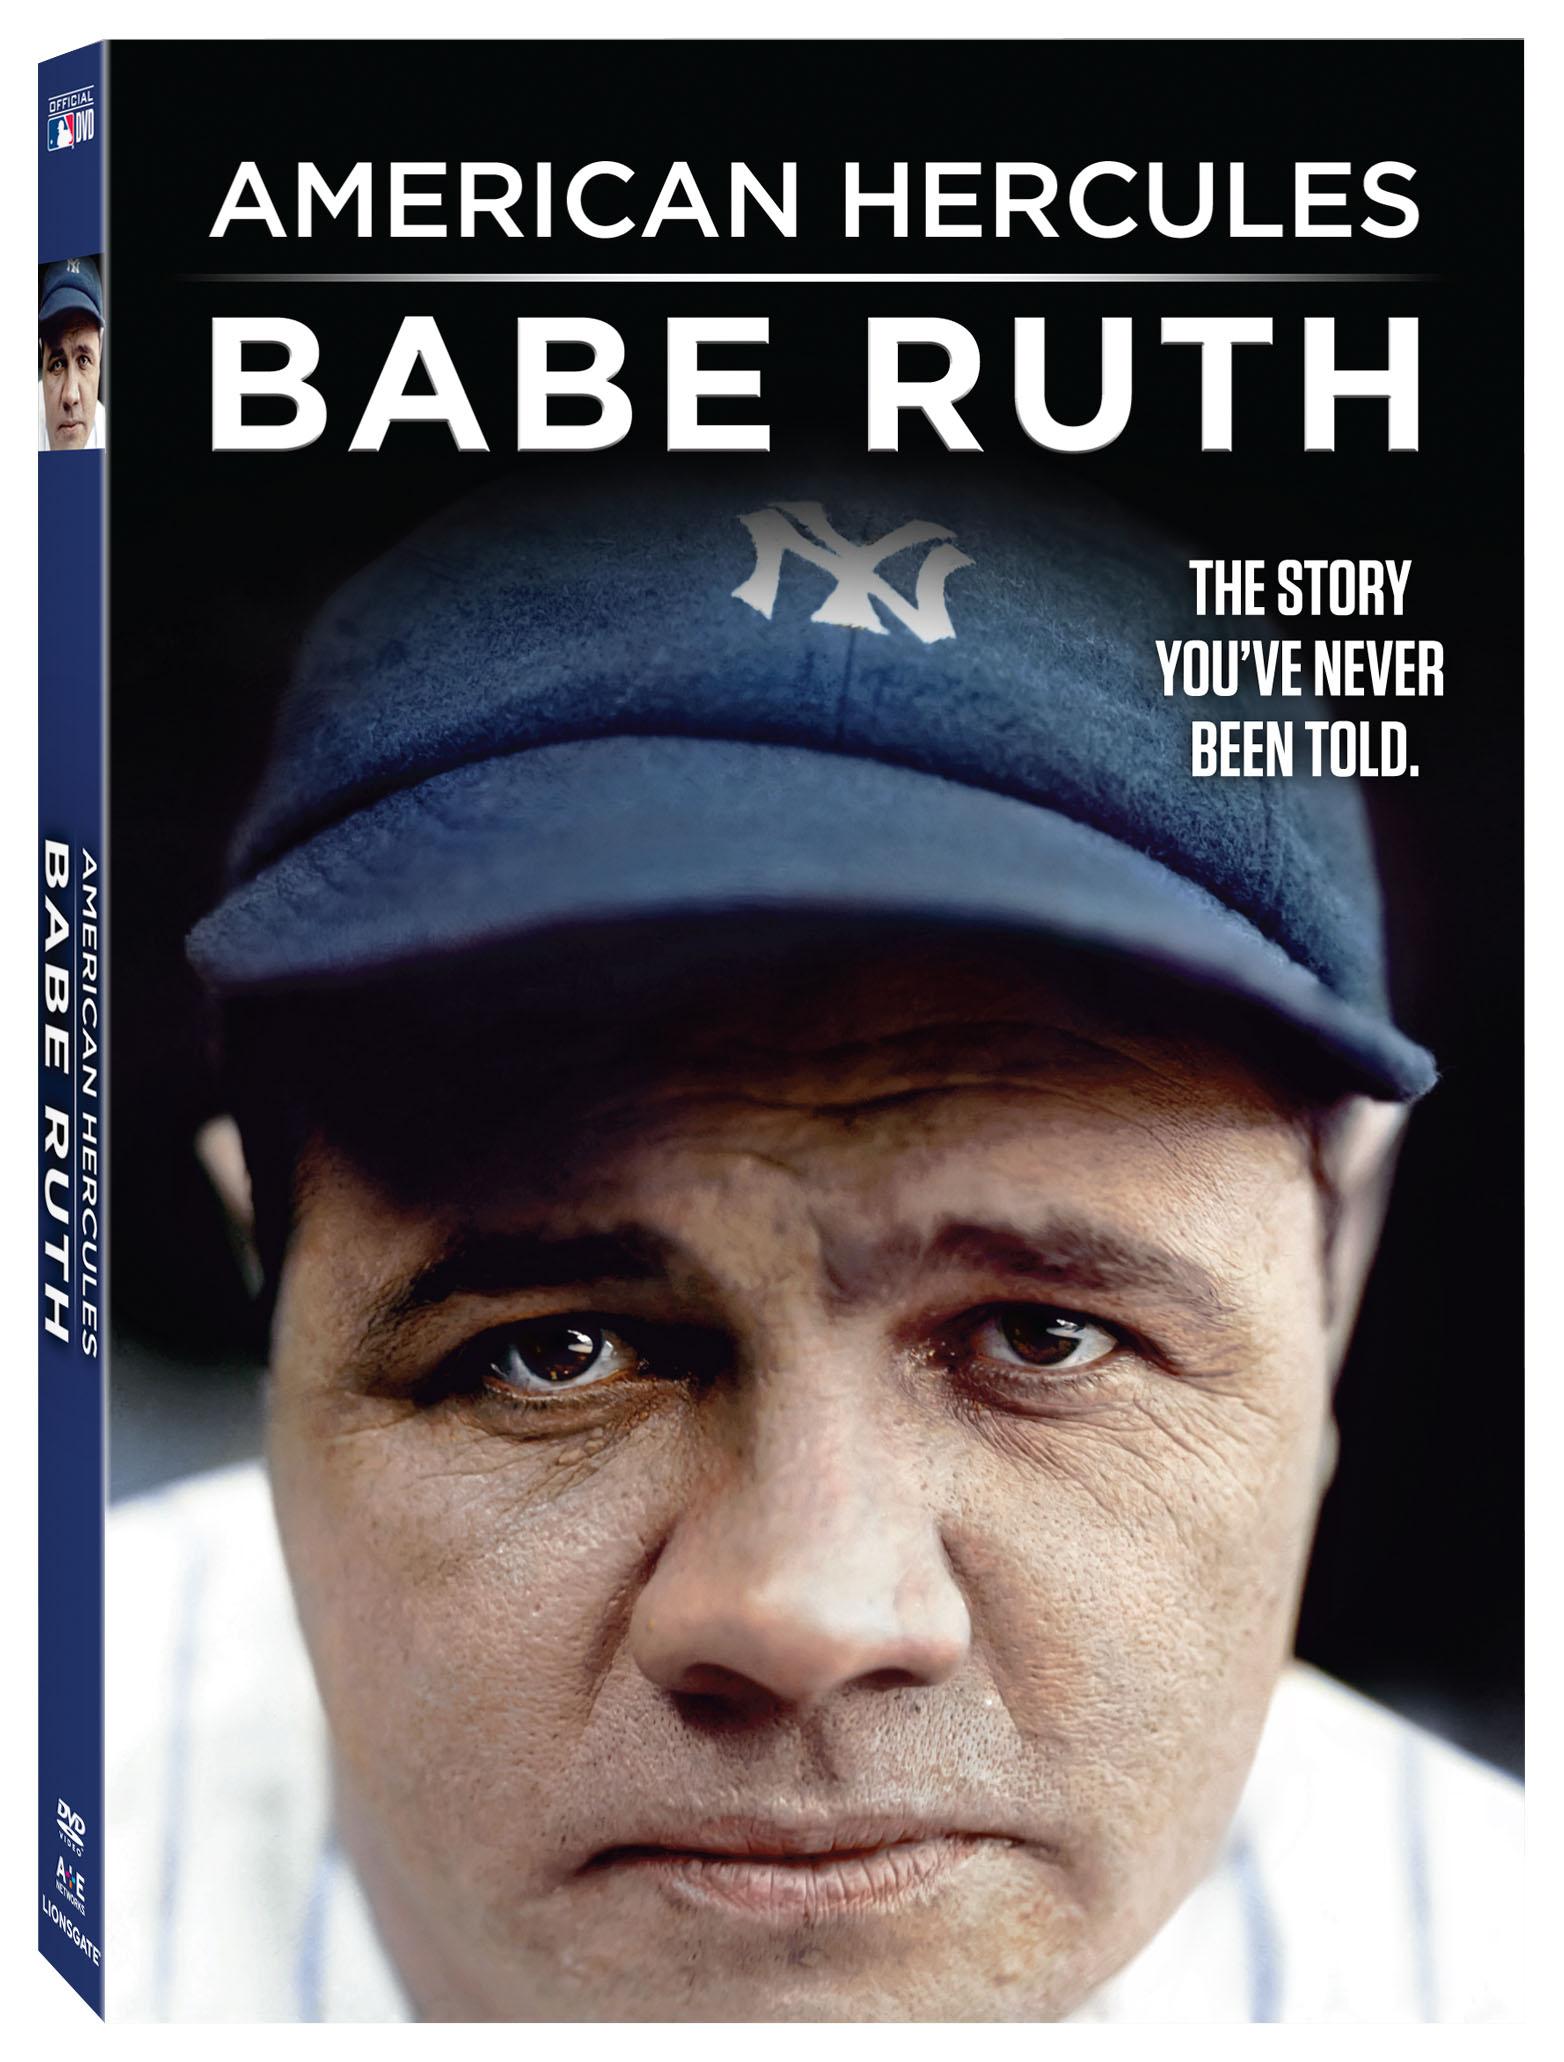 American Hercules Babe Ruth Dvd-6335